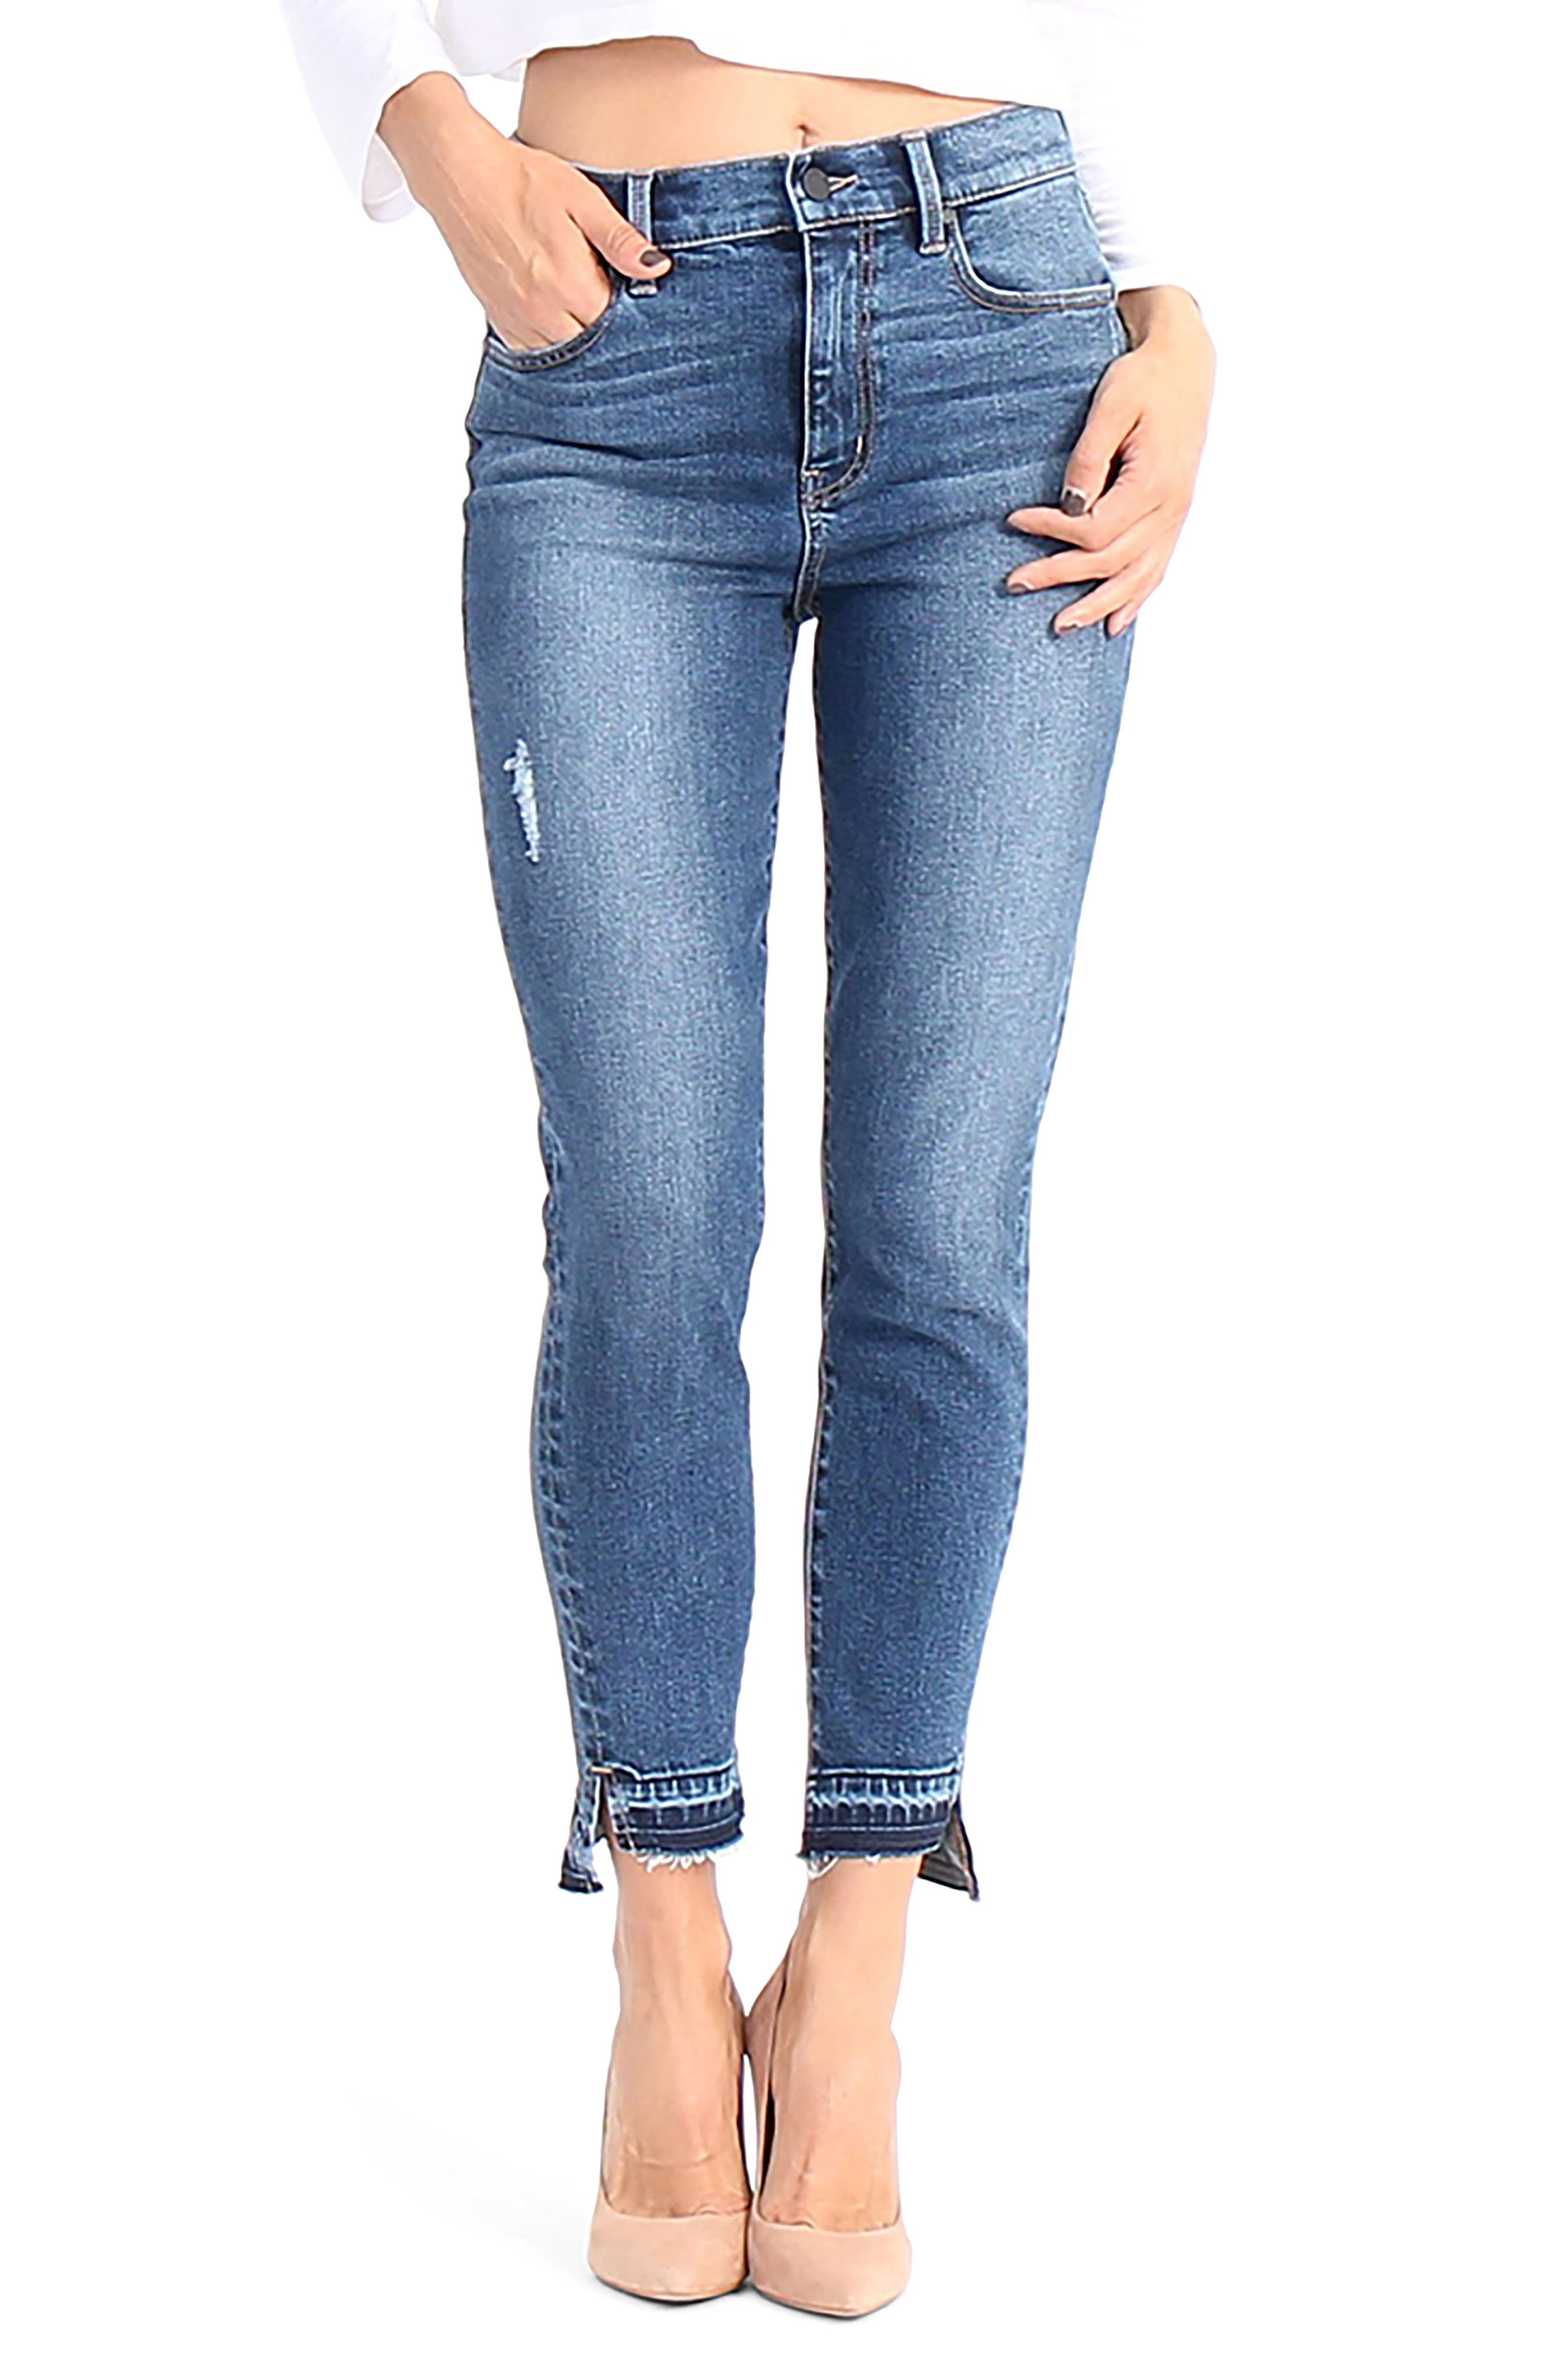 Elle Uneven Hem Skinny Jeans,                             Main thumbnail 1, color,                             After Glow